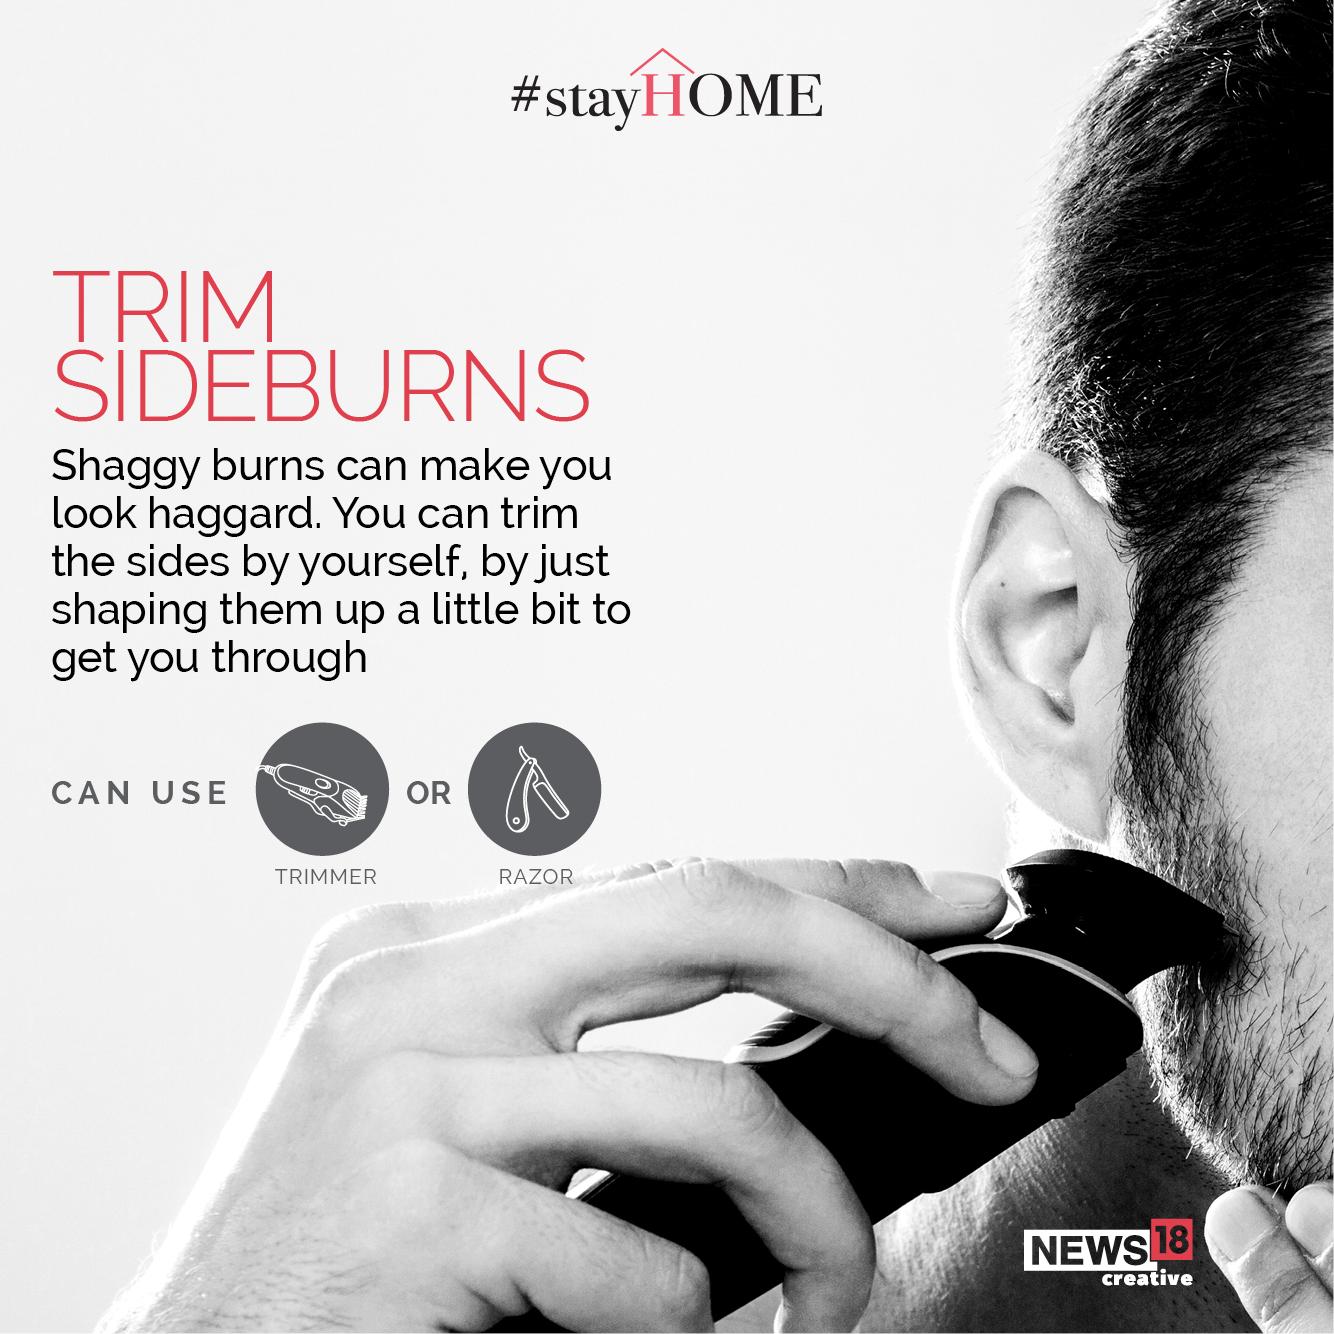 Tip 1 Trim Sideburns (Image: News18 Creative)